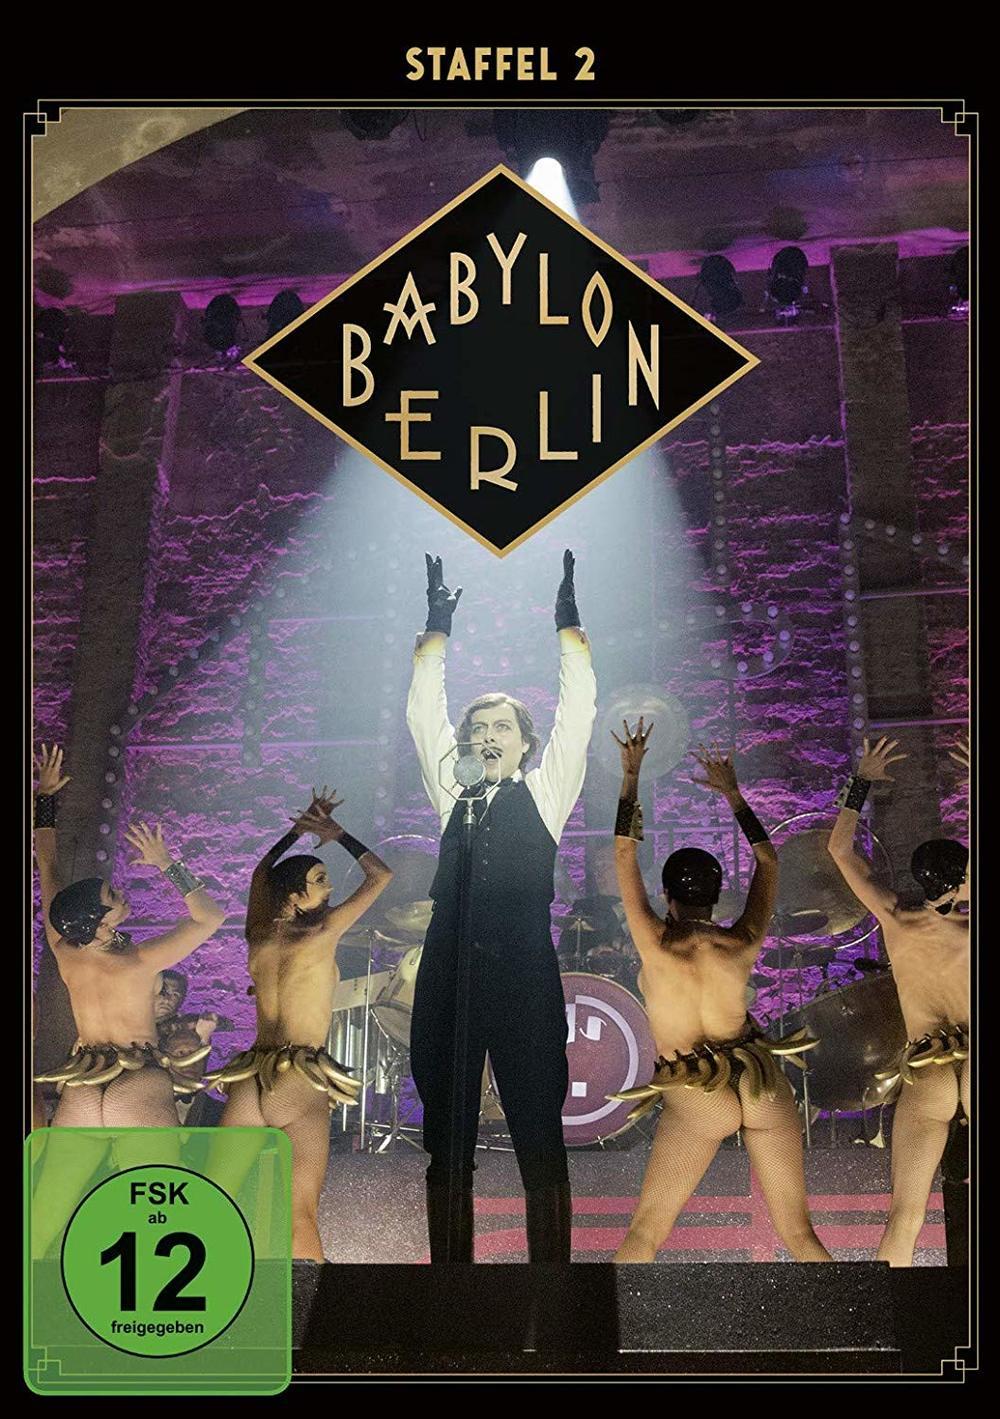 Staffel 2 Babylon Berlin